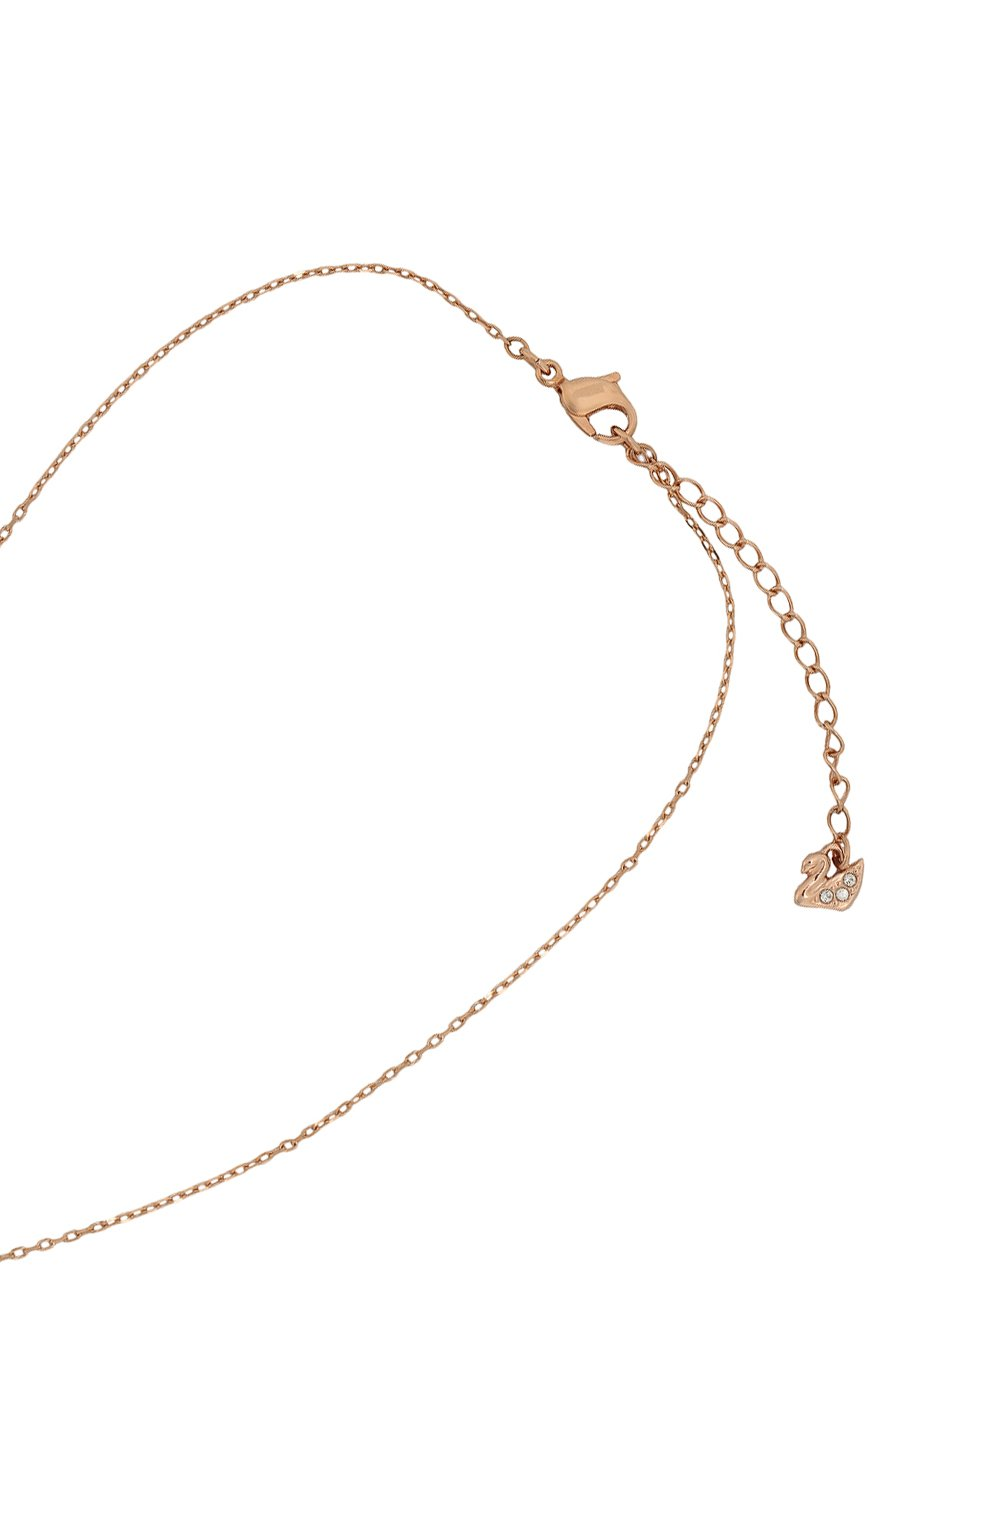 Женское ожерелье iconic swan double y SWAROVSKI золотого цвета, арт. 5351806 | Фото 3